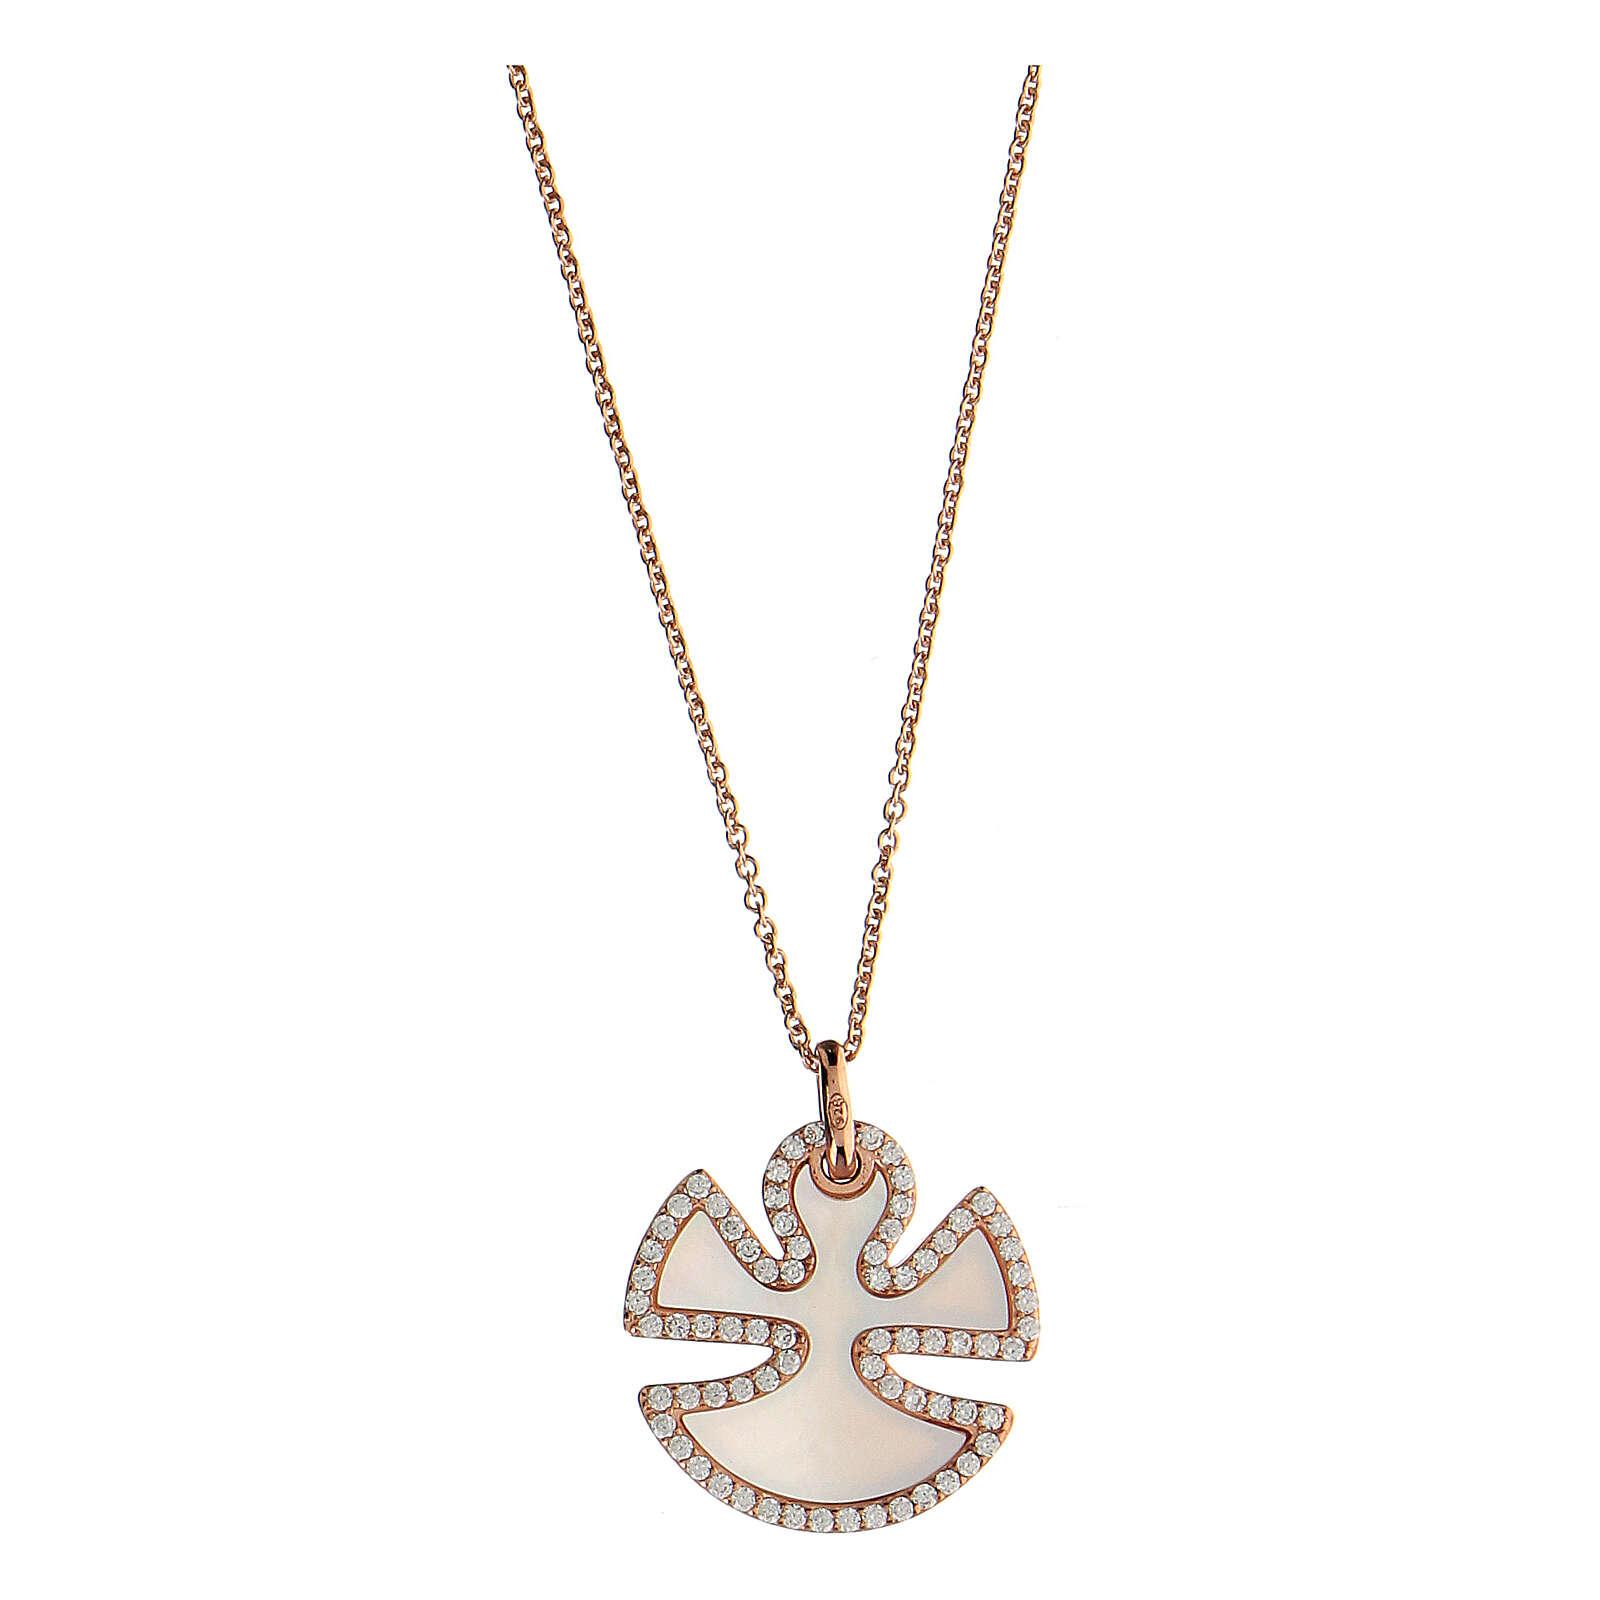 Collana angelo argento 925 madreperla zirconi 4